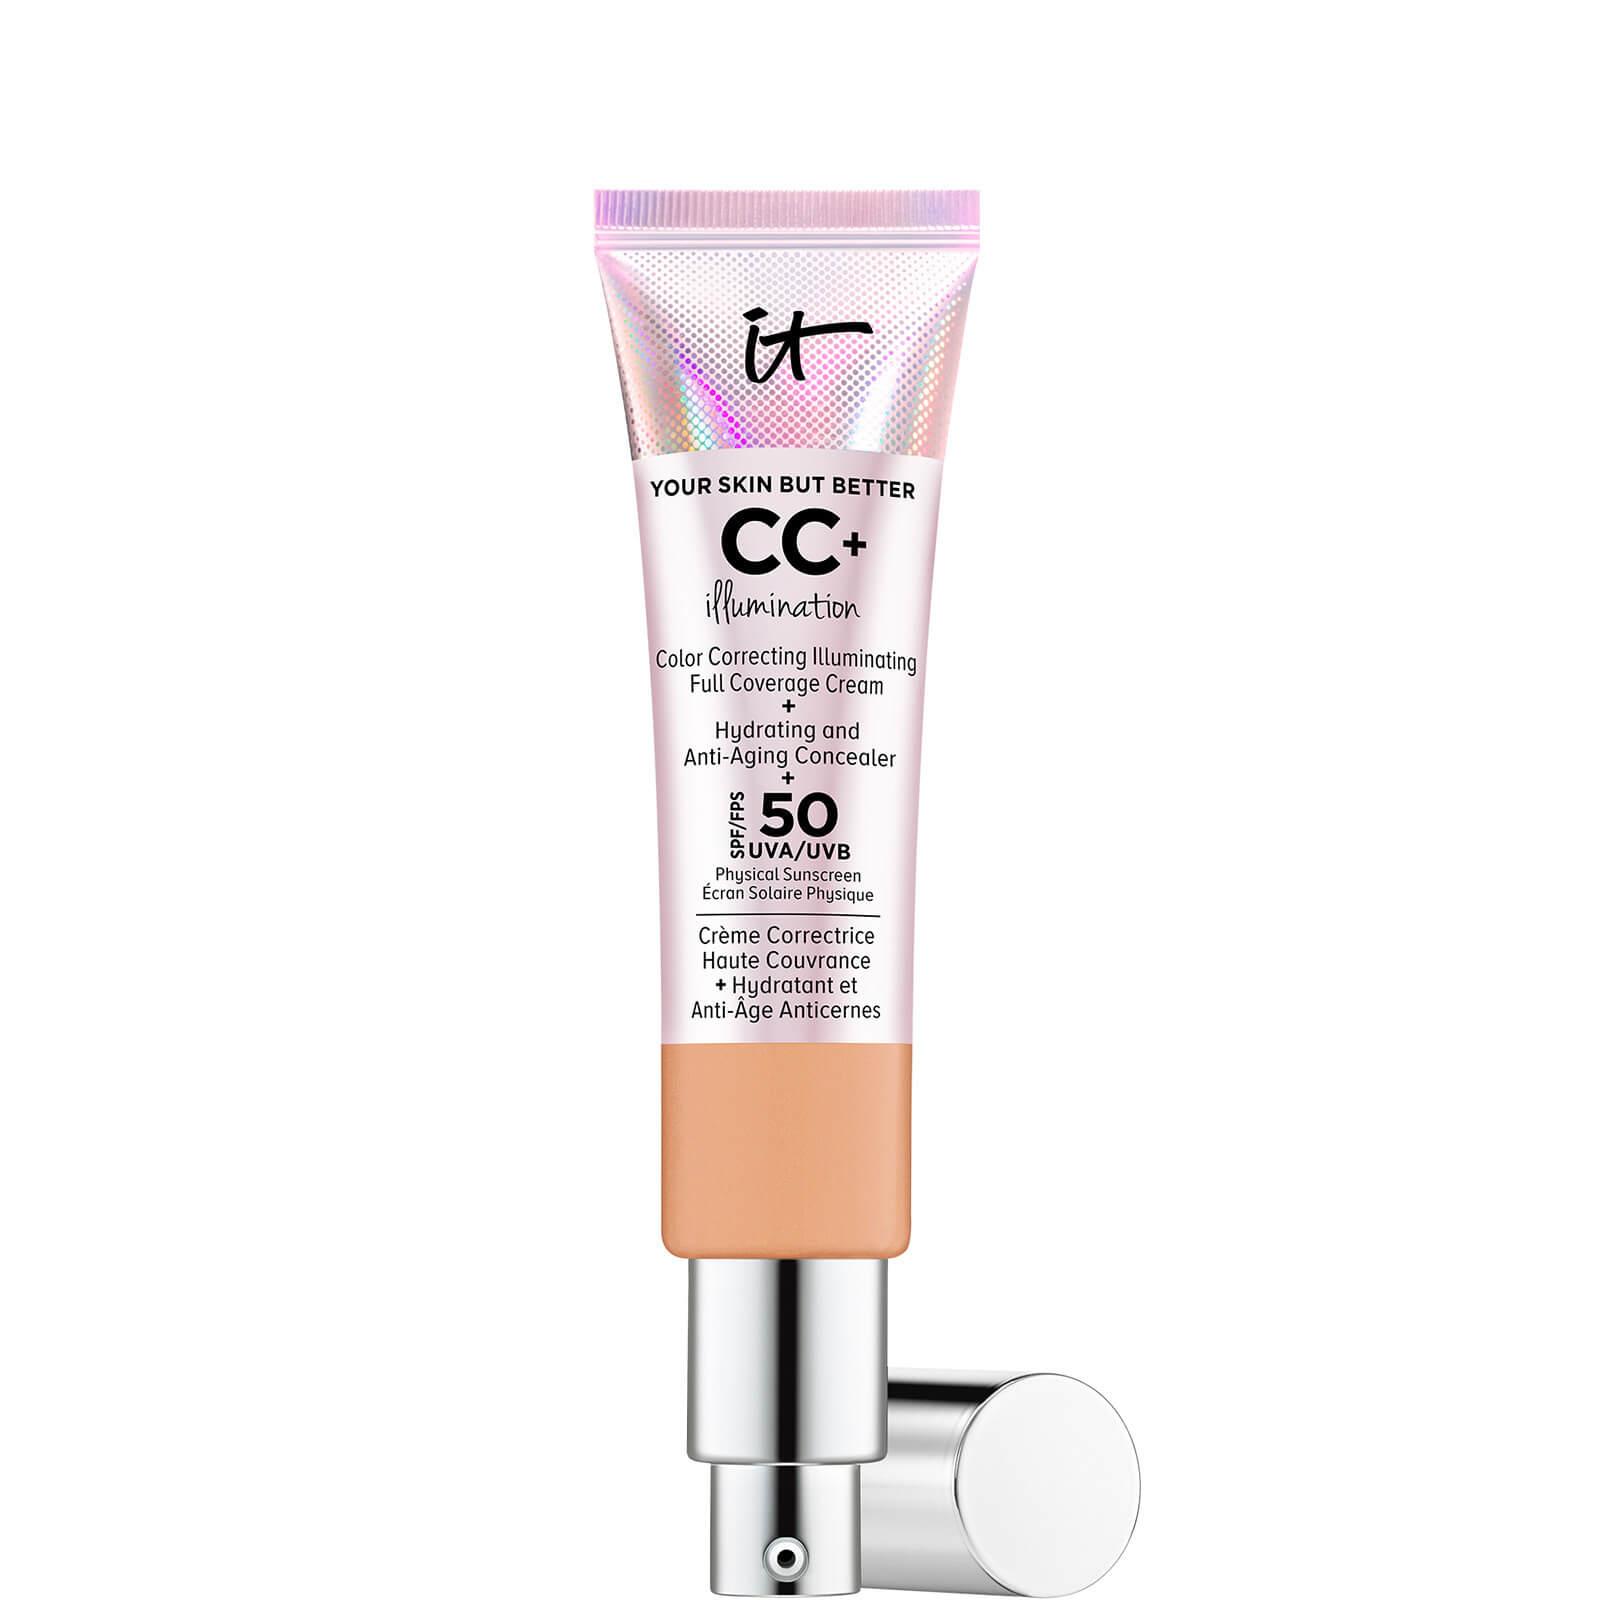 Купить IT Cosmetics Your Skin But Better CC+ Illumination SPF50 32ml (Various Shades) - Neutral Tan